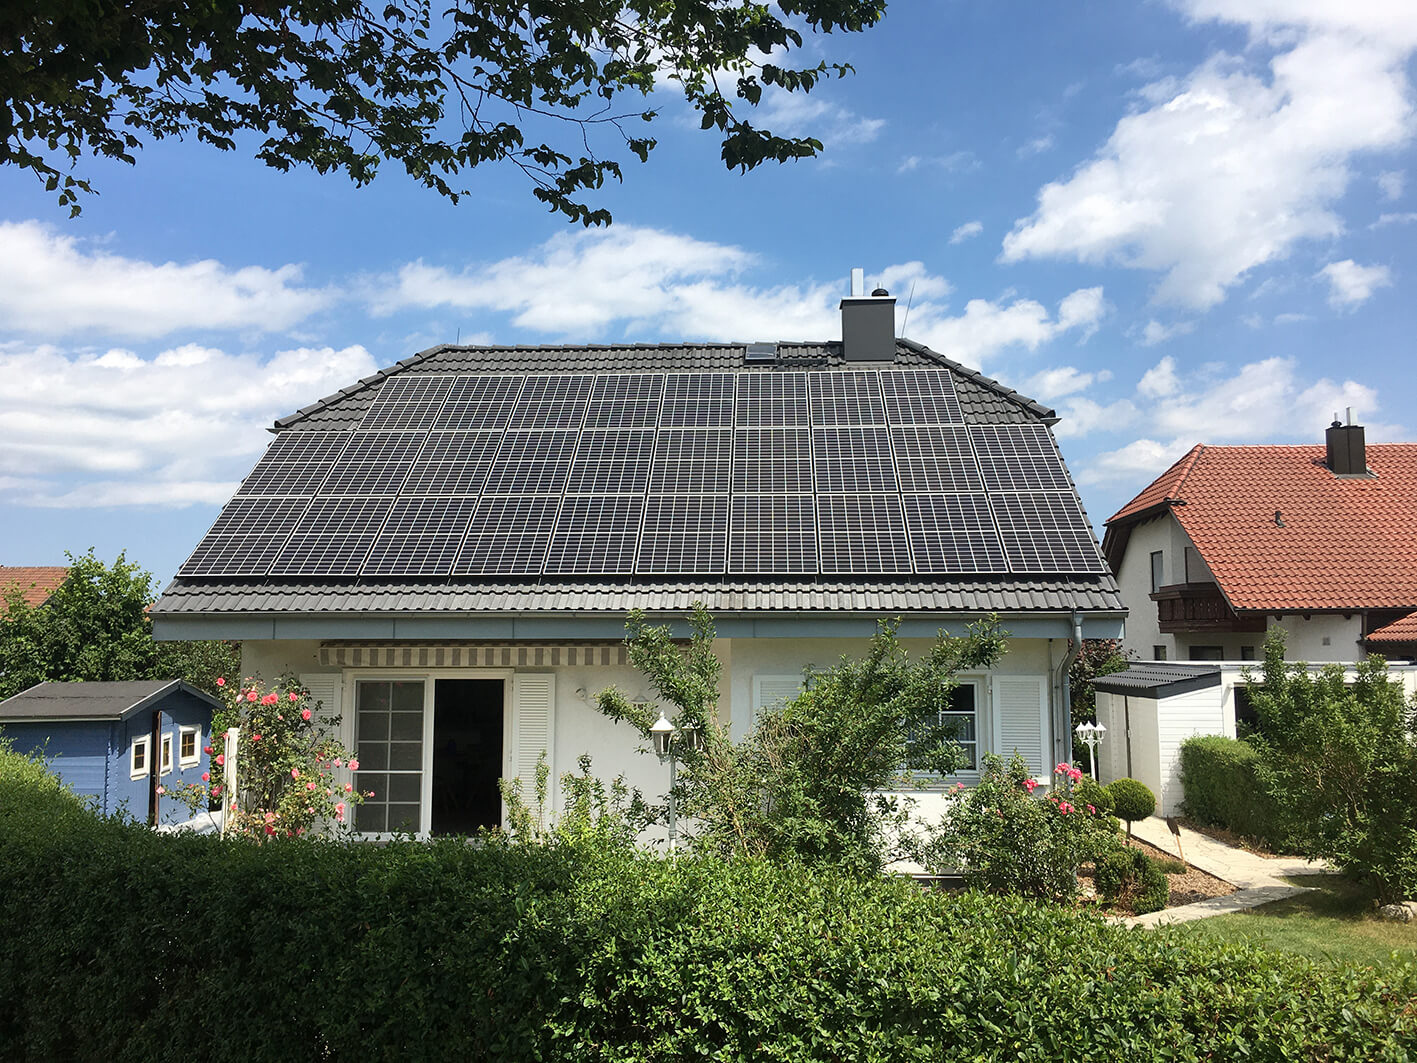 Referenz e.systeme21 | Privatkunde, Geislingen